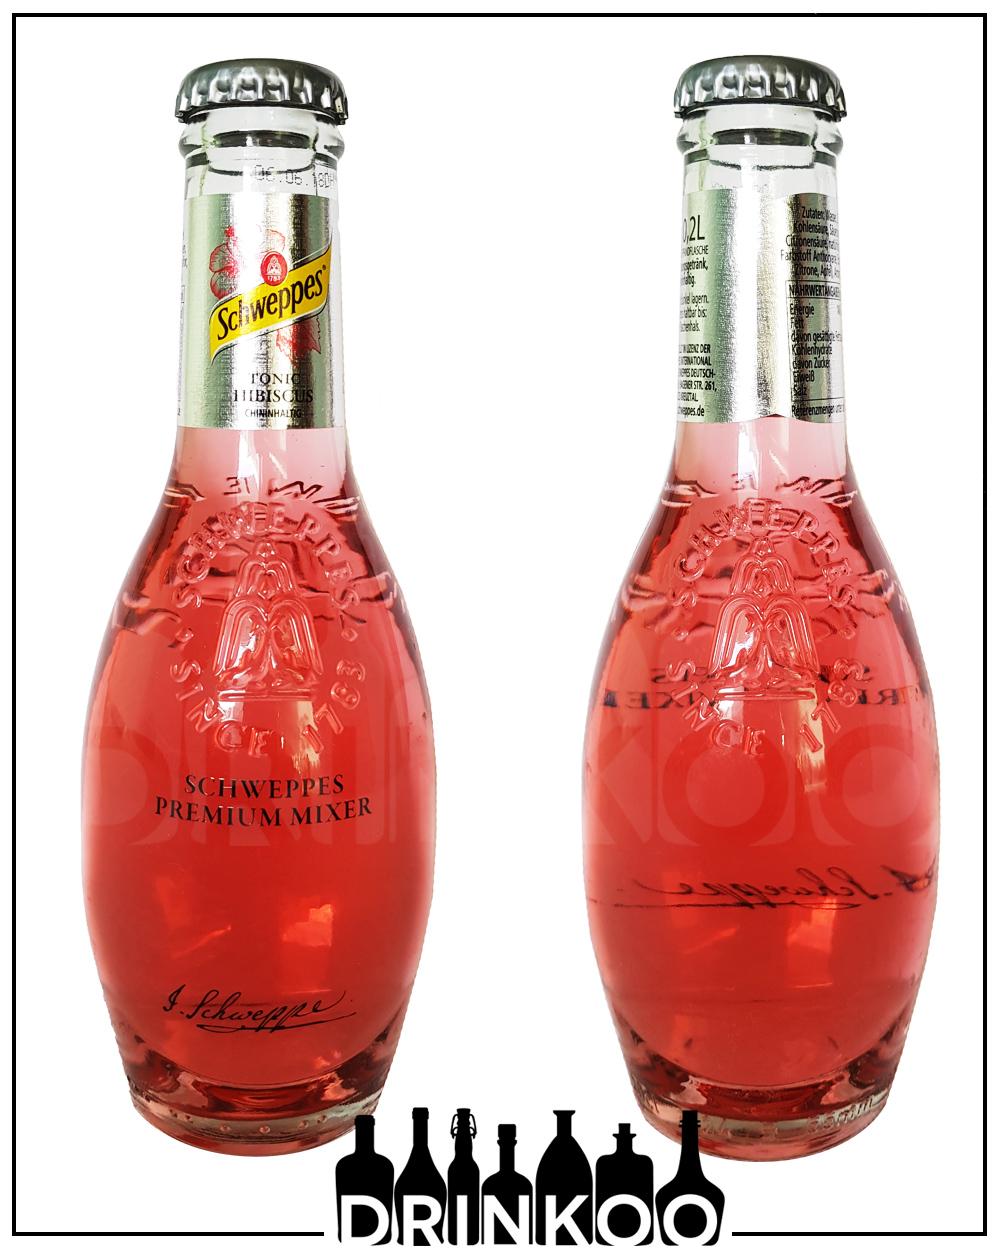 Schweppes Hibiscus Tonic Water